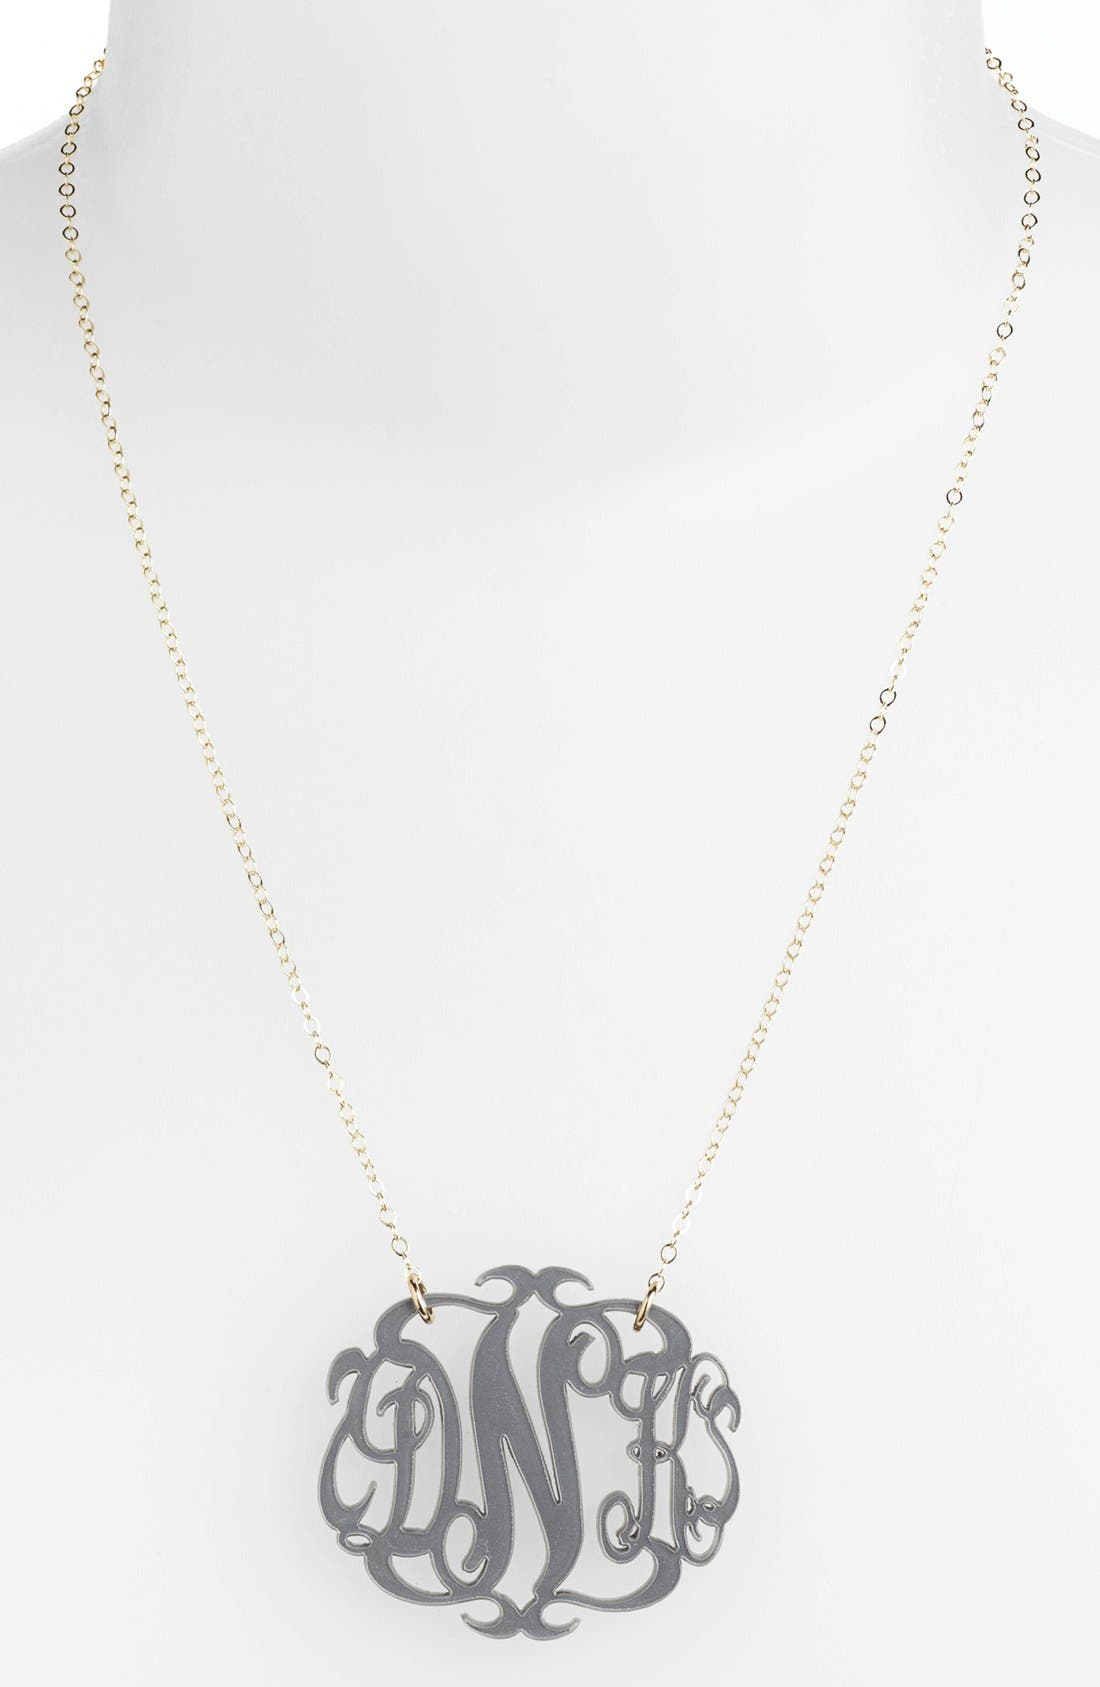 Large Oval Personalized Monogram Pendant Necklace,                         Main,                         color, Gunmetal/ Gold